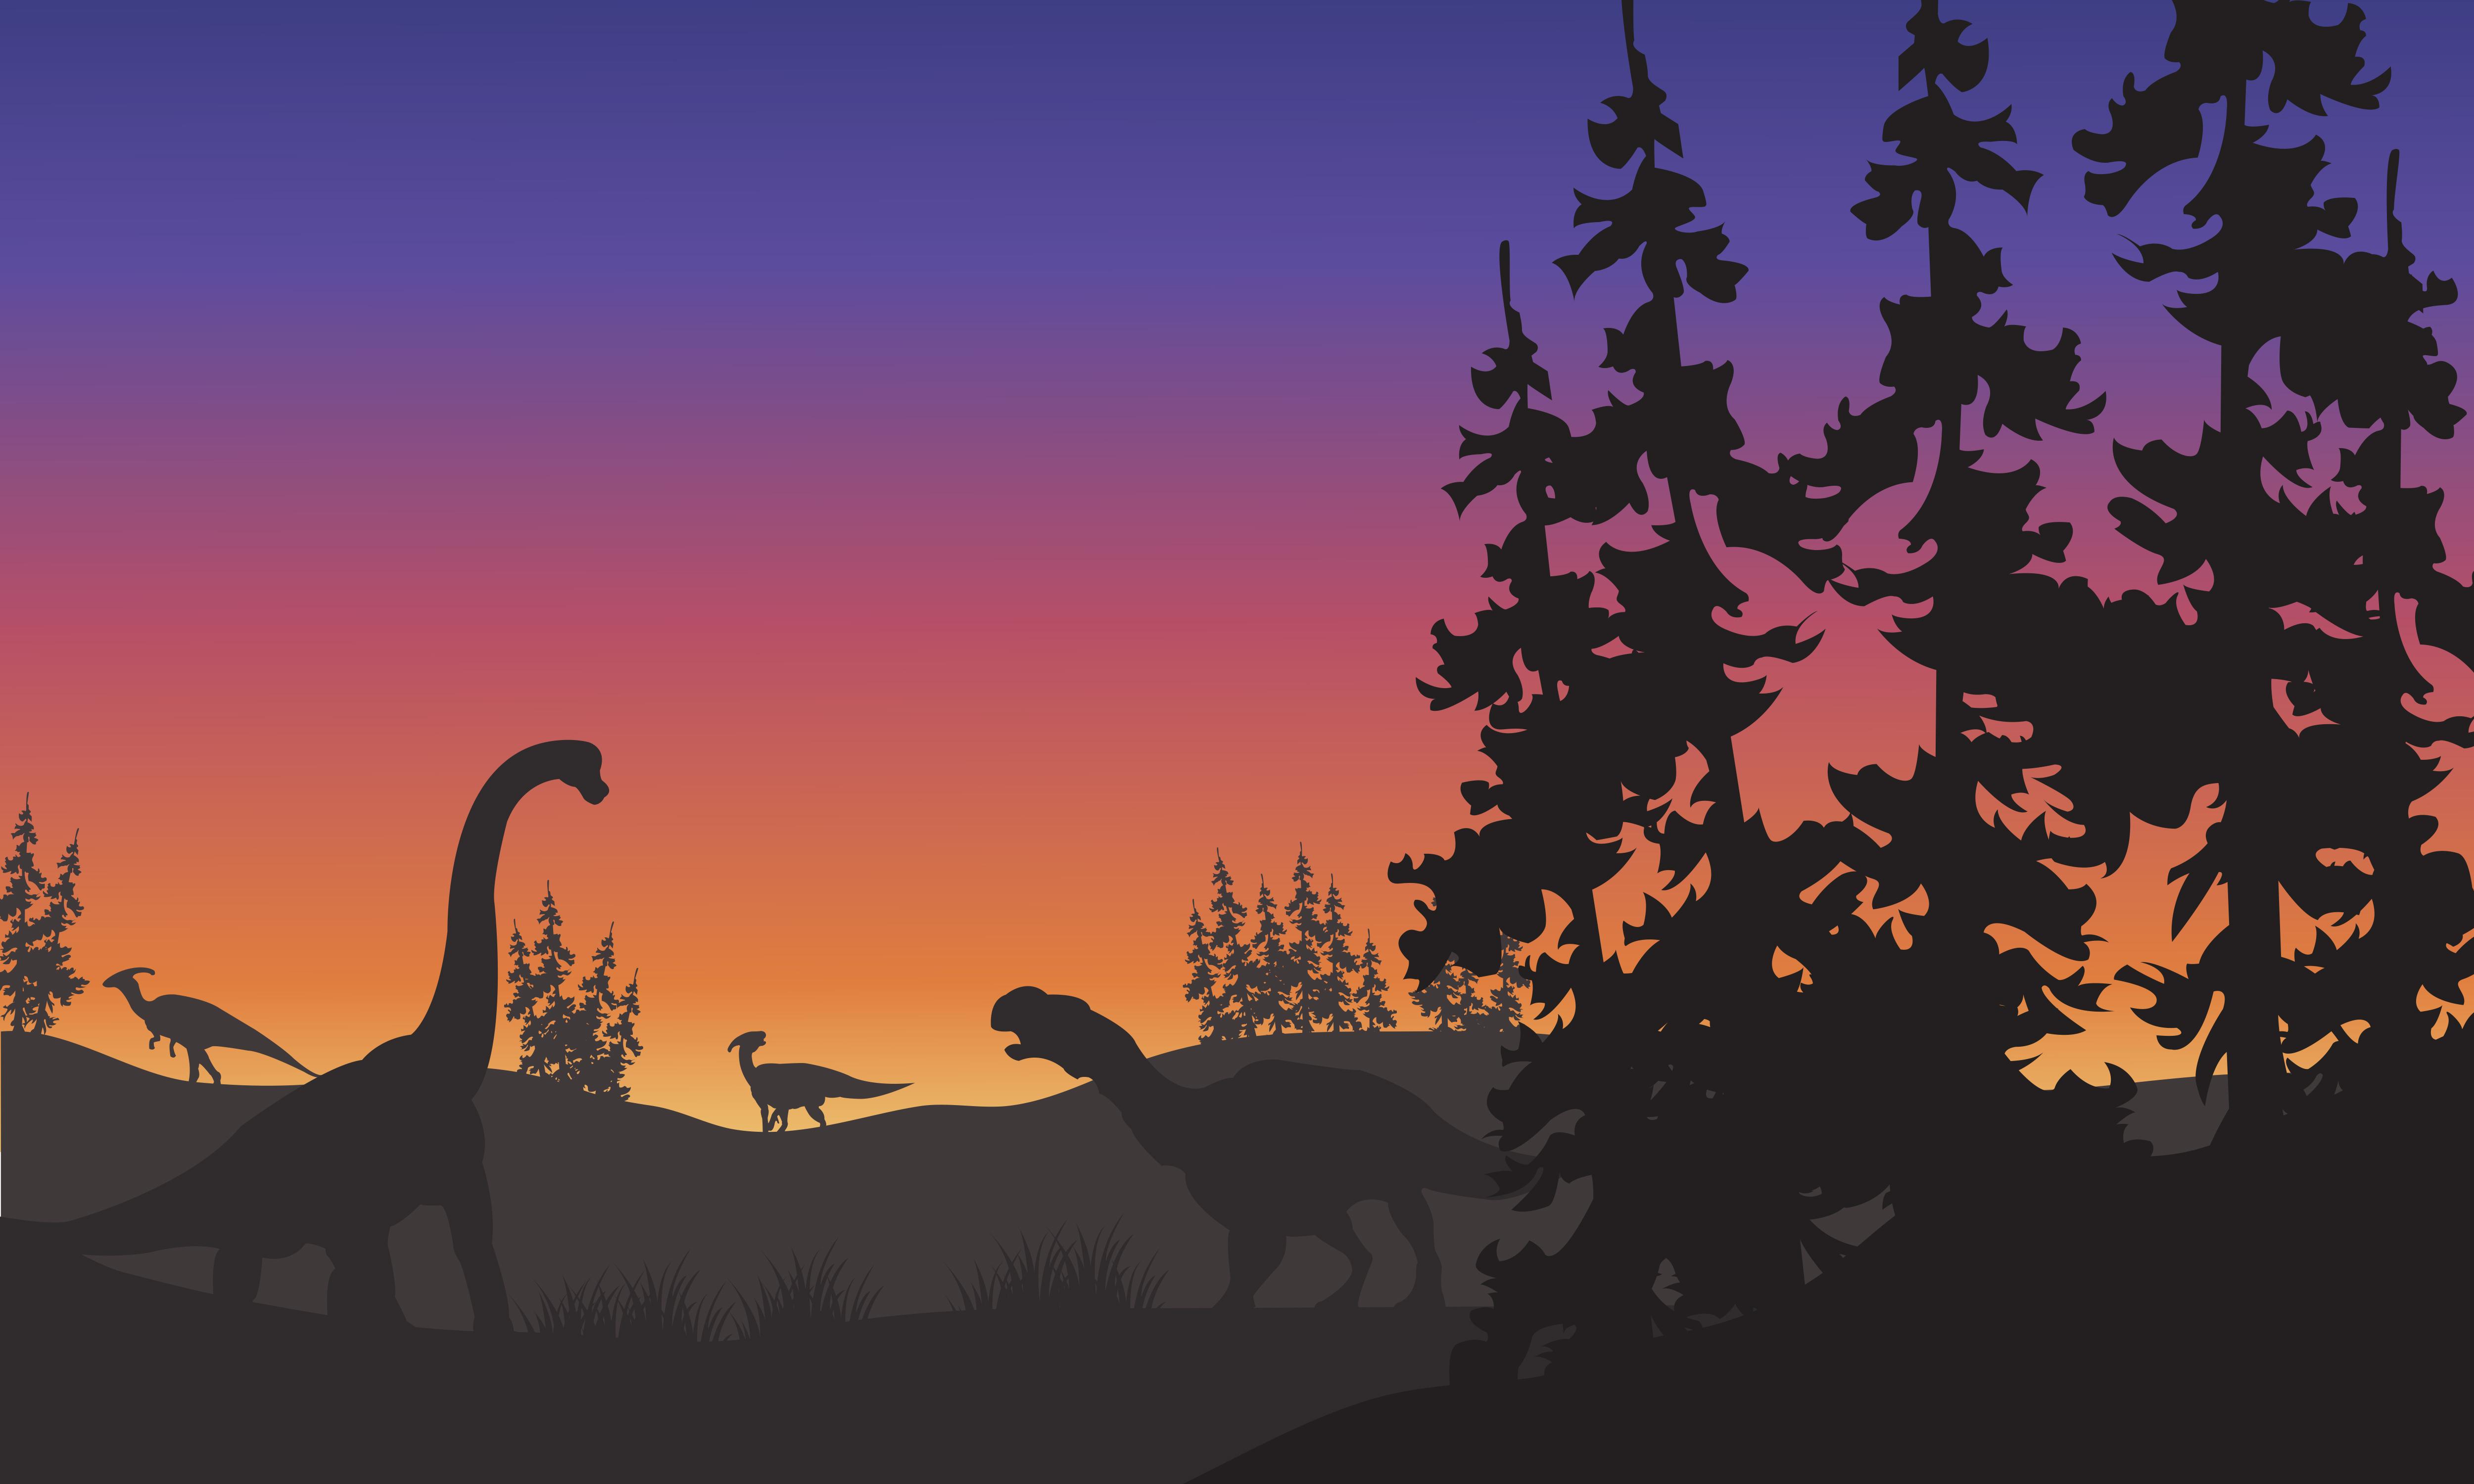 Silhouette of Brachiosaurus and Iguanodon